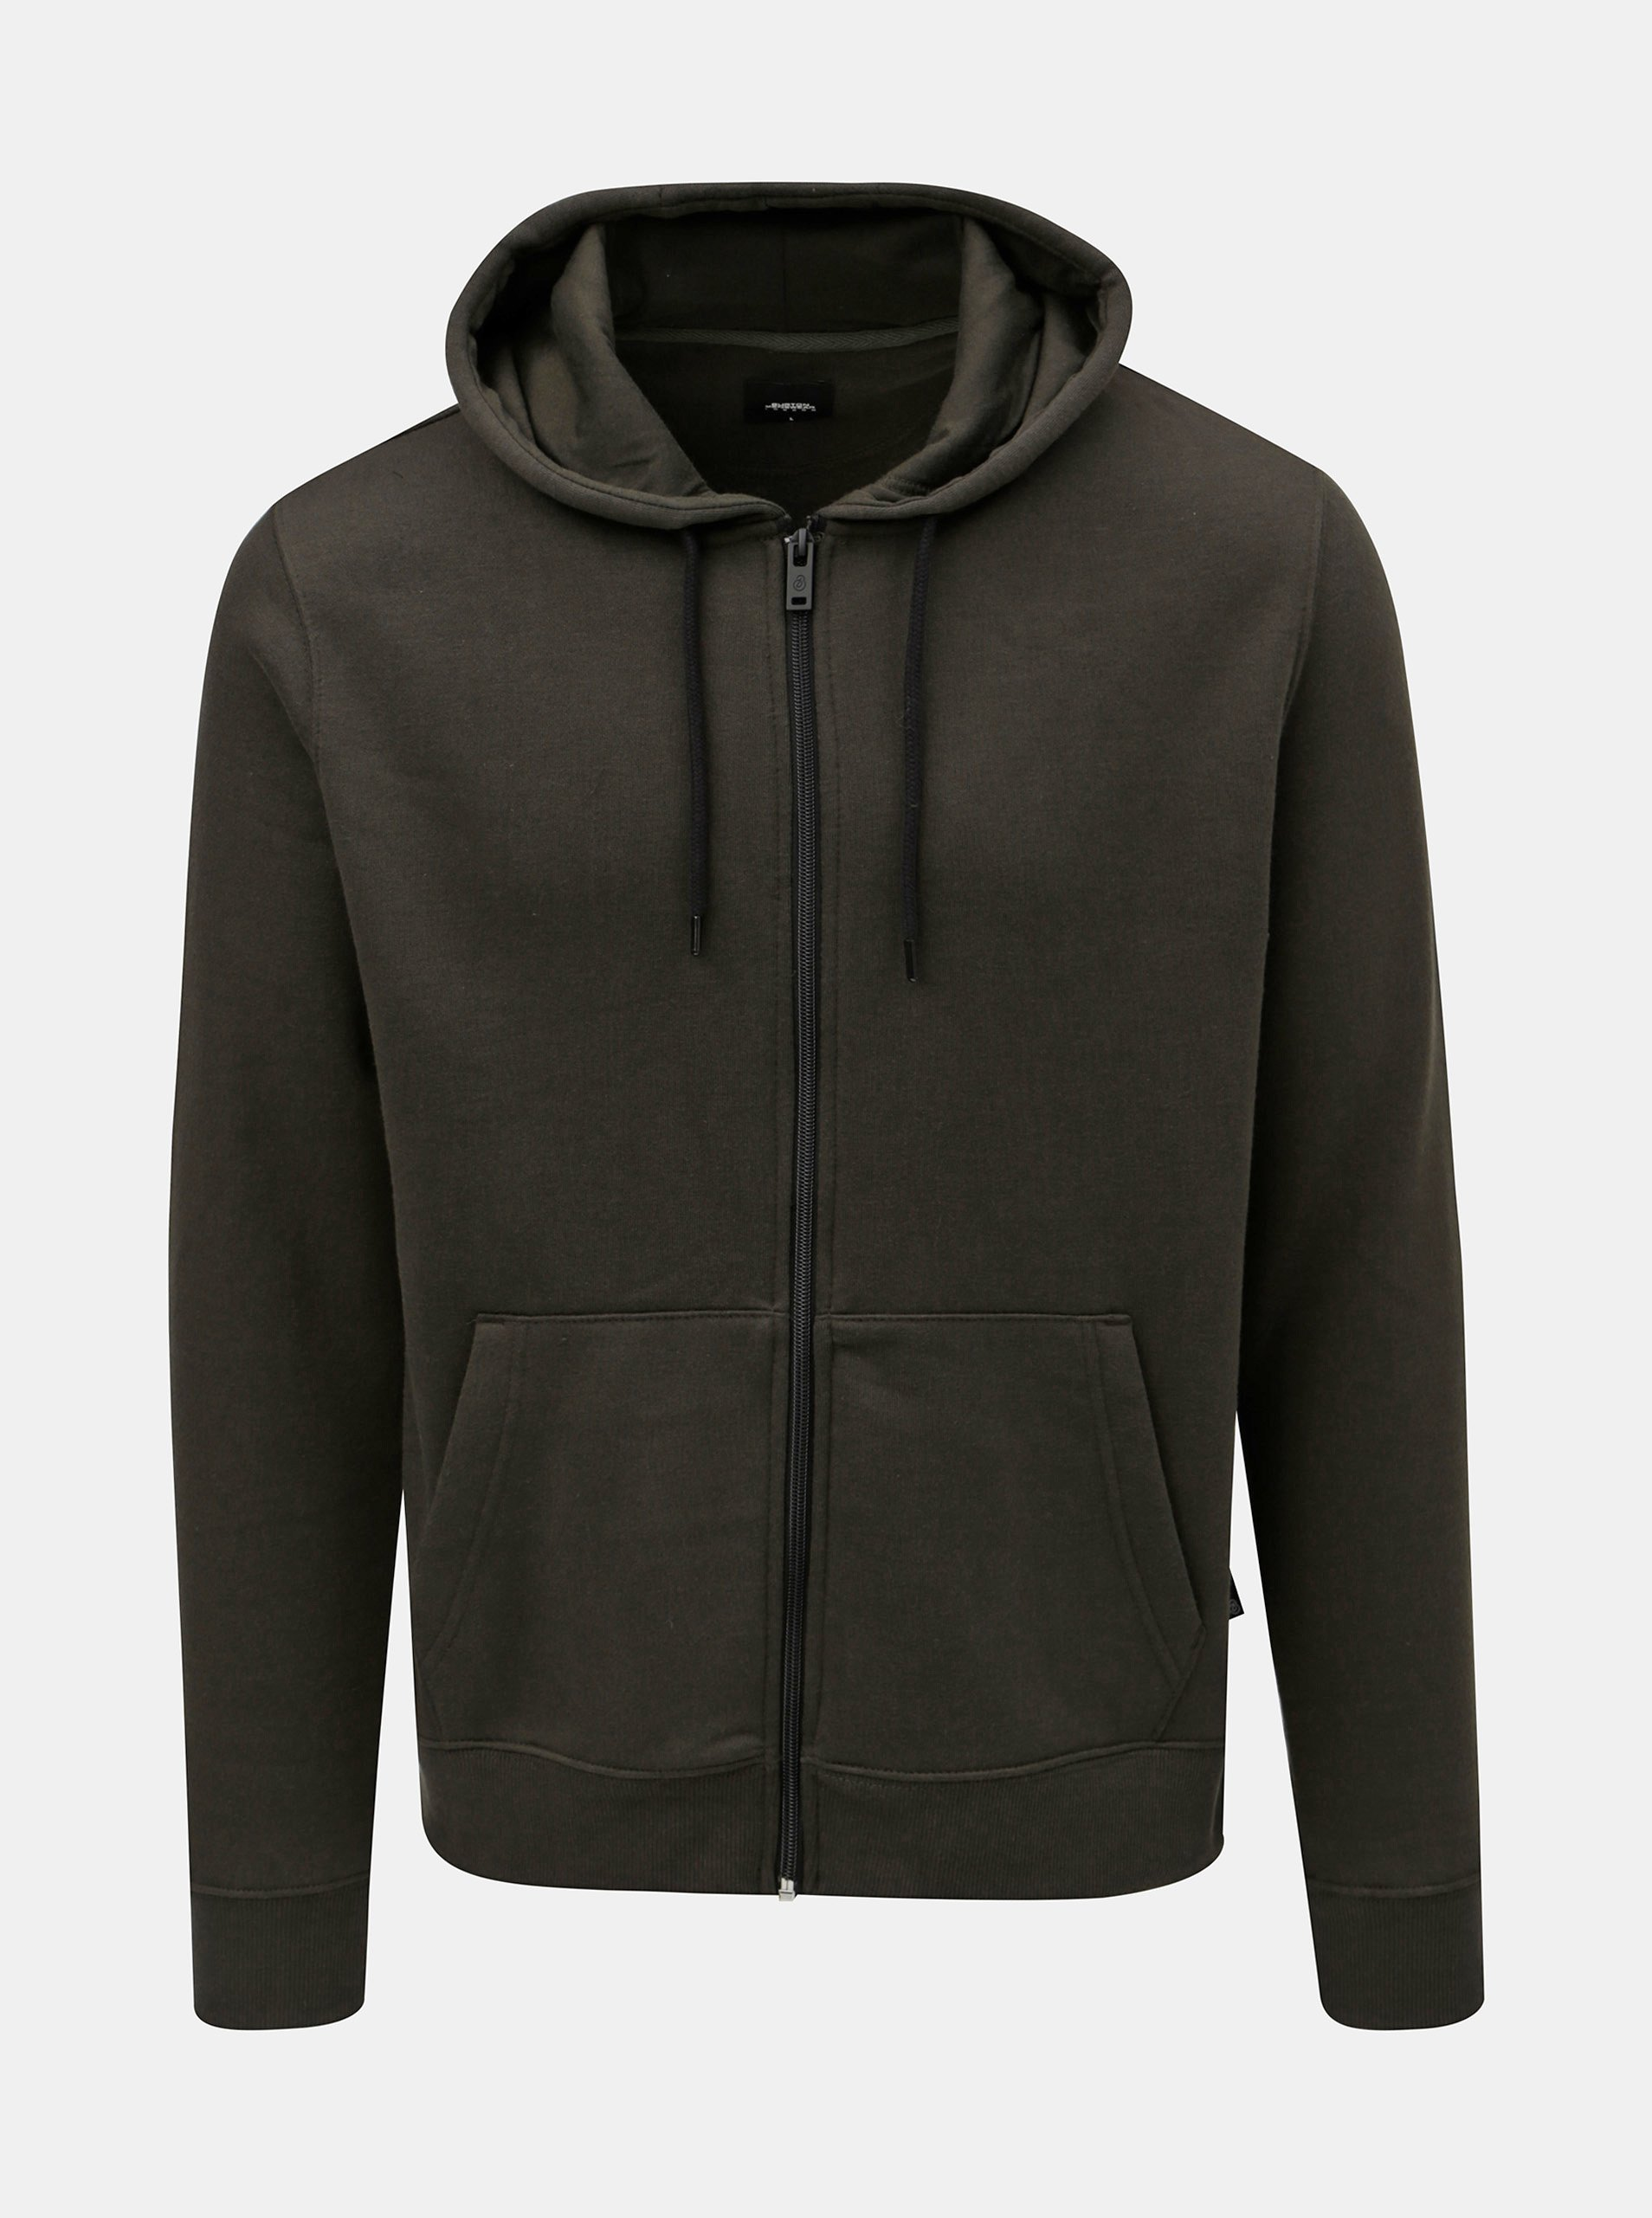 37b02c8a4b Khaki mikina s kapucí na zip Burton Menswear London